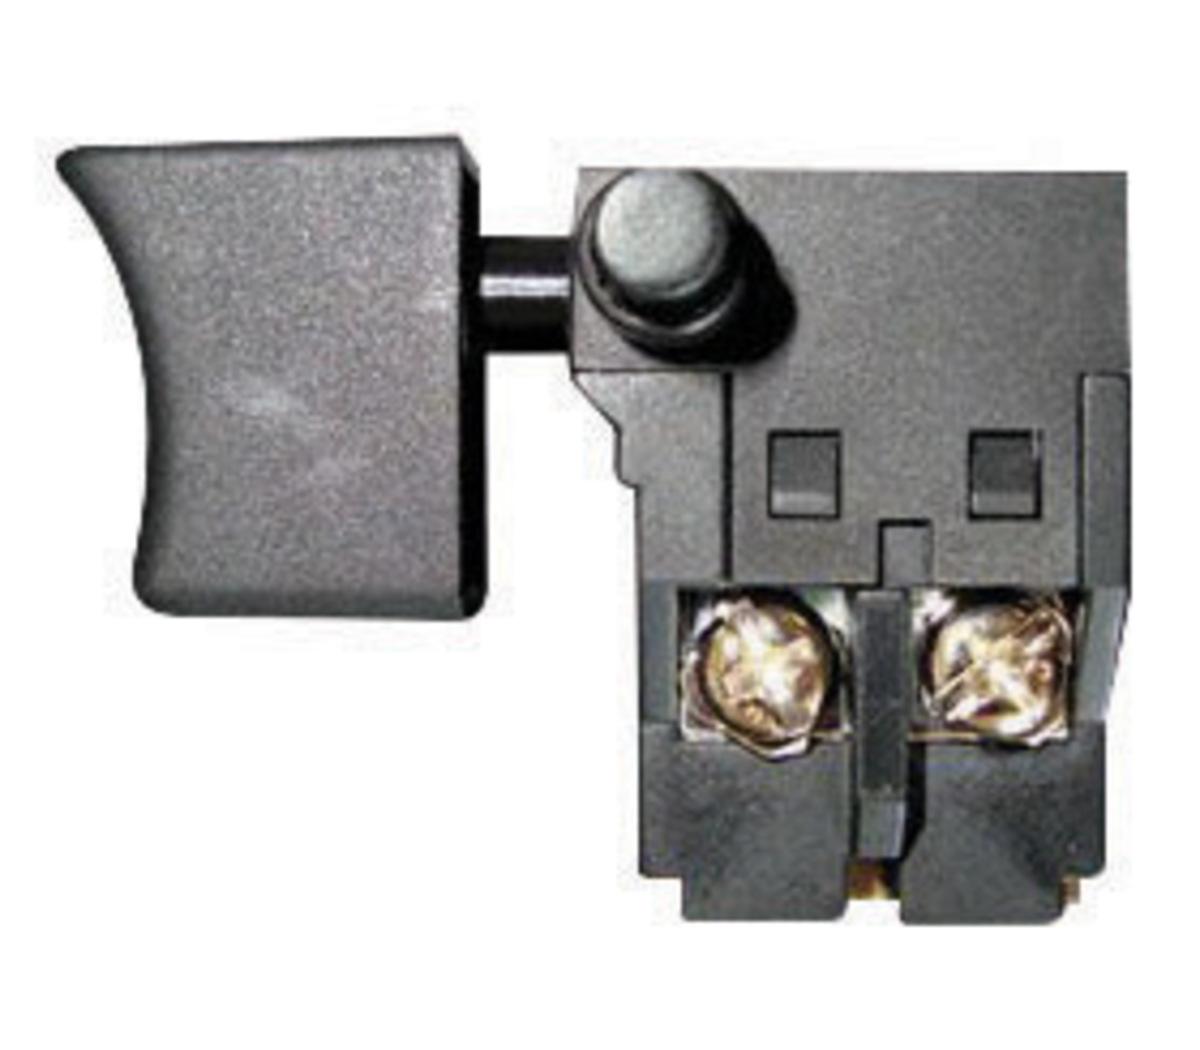 makita disc sander. makita® trigger switch (for use with finishing sander, planer and disc sander) makita sander